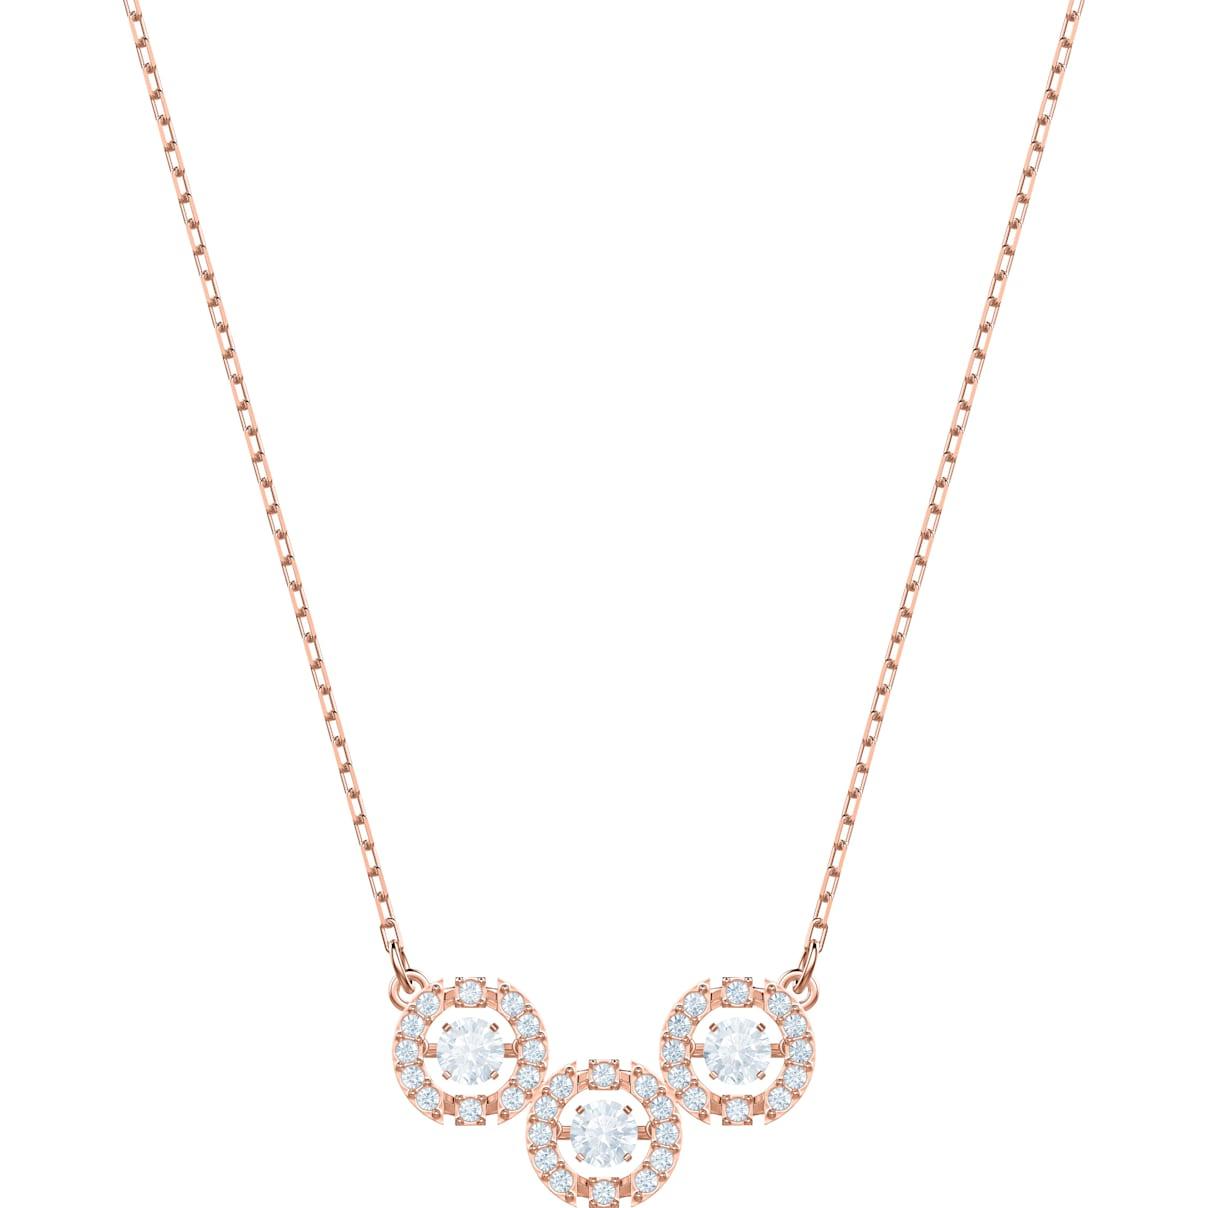 Swarovski Swarovski Sparkling Dance Trilogy Necklace, White, Rose-gold tone plated